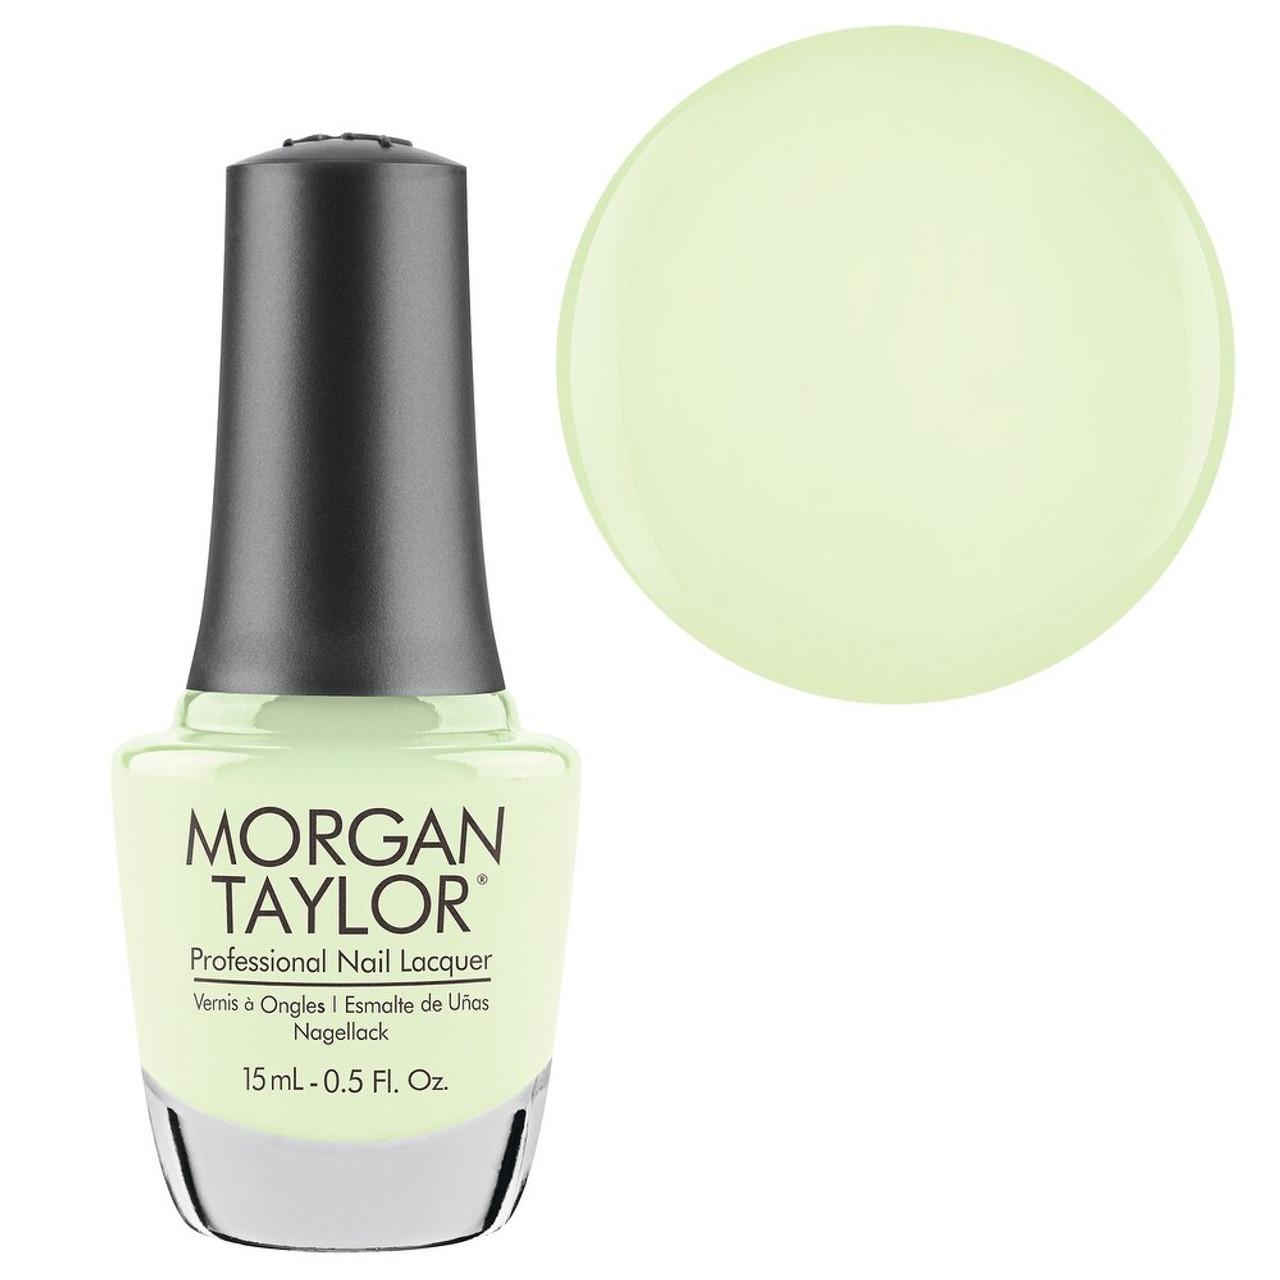 Morgan Taylor Glow In The Dark Top Coat - 0.5oz